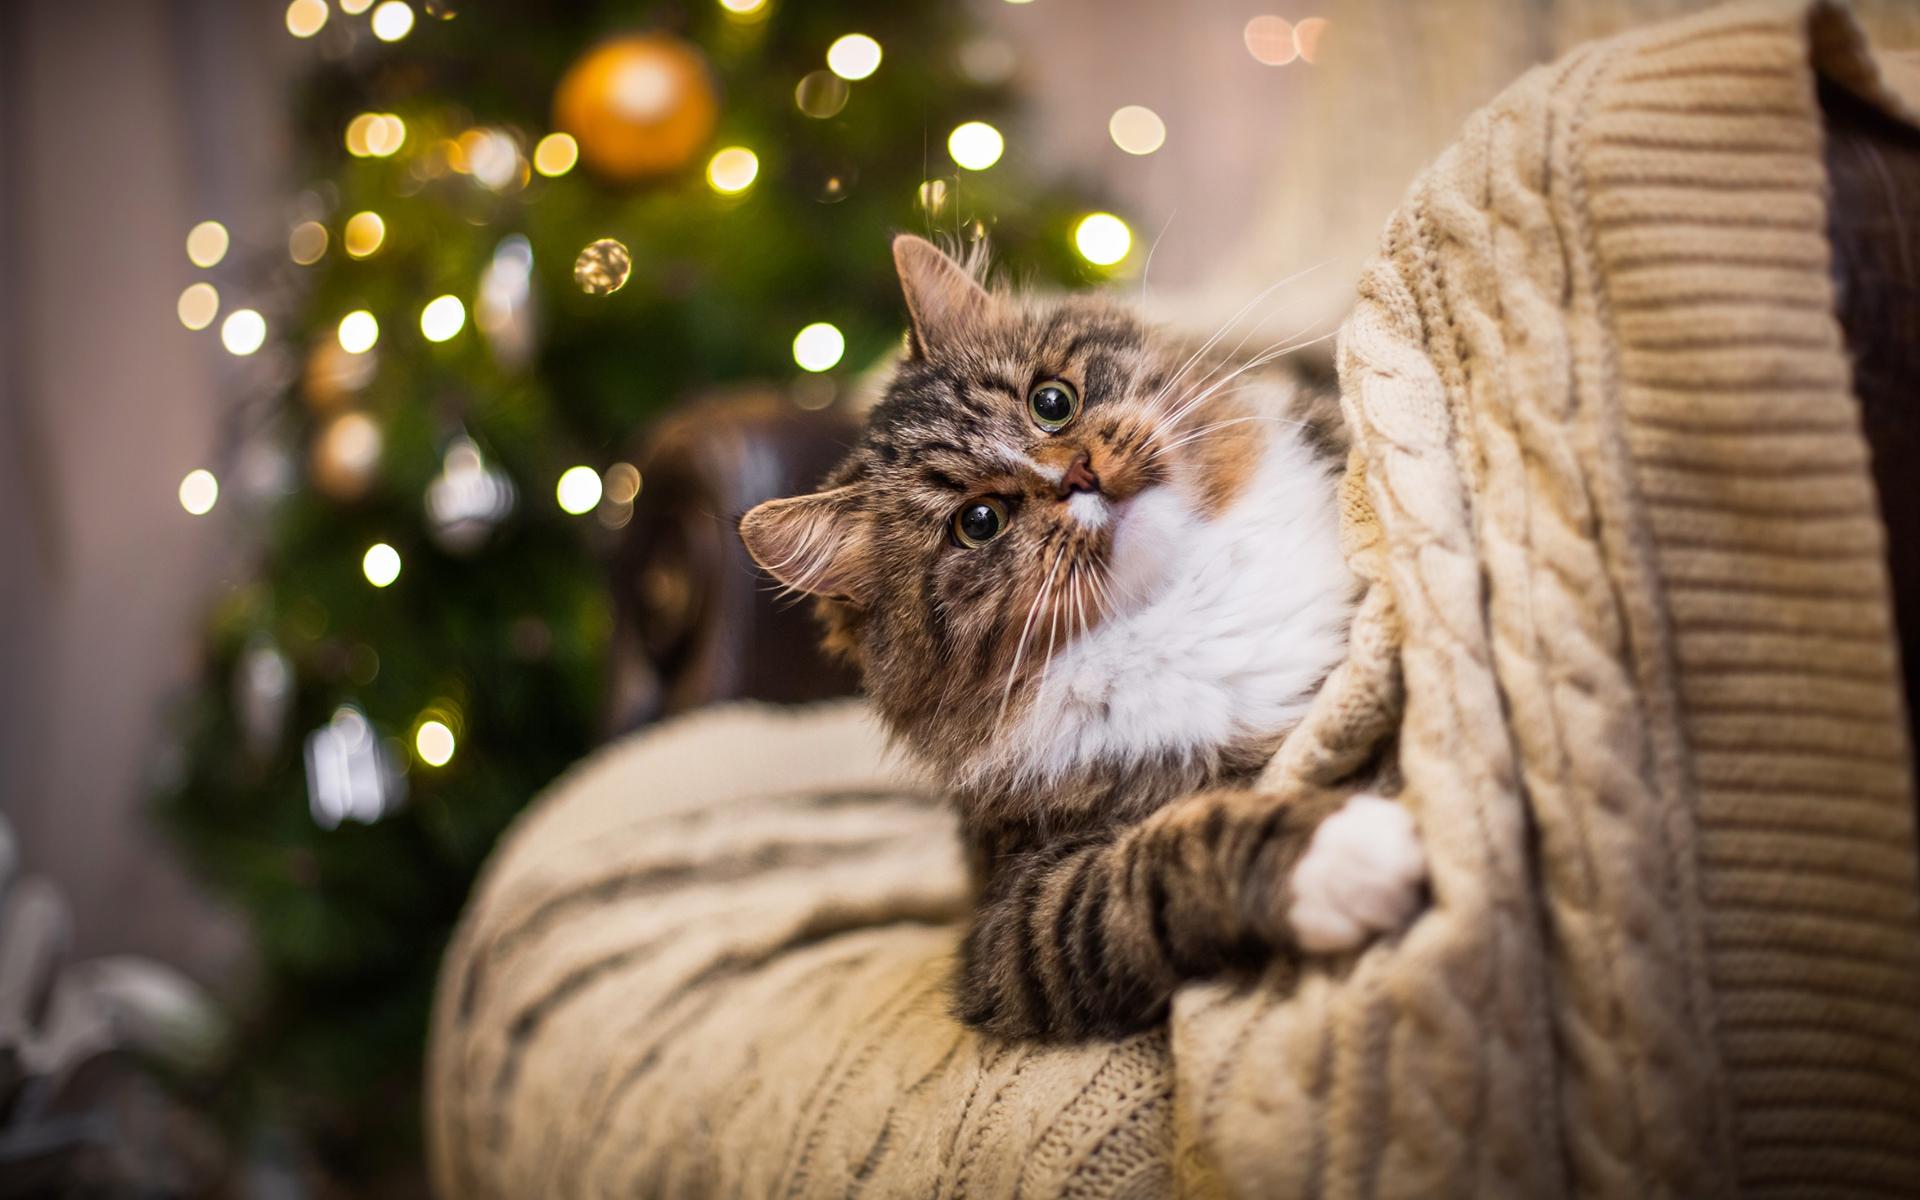 Картинка: Кошка, взгляд, свитер, блики, ёлка